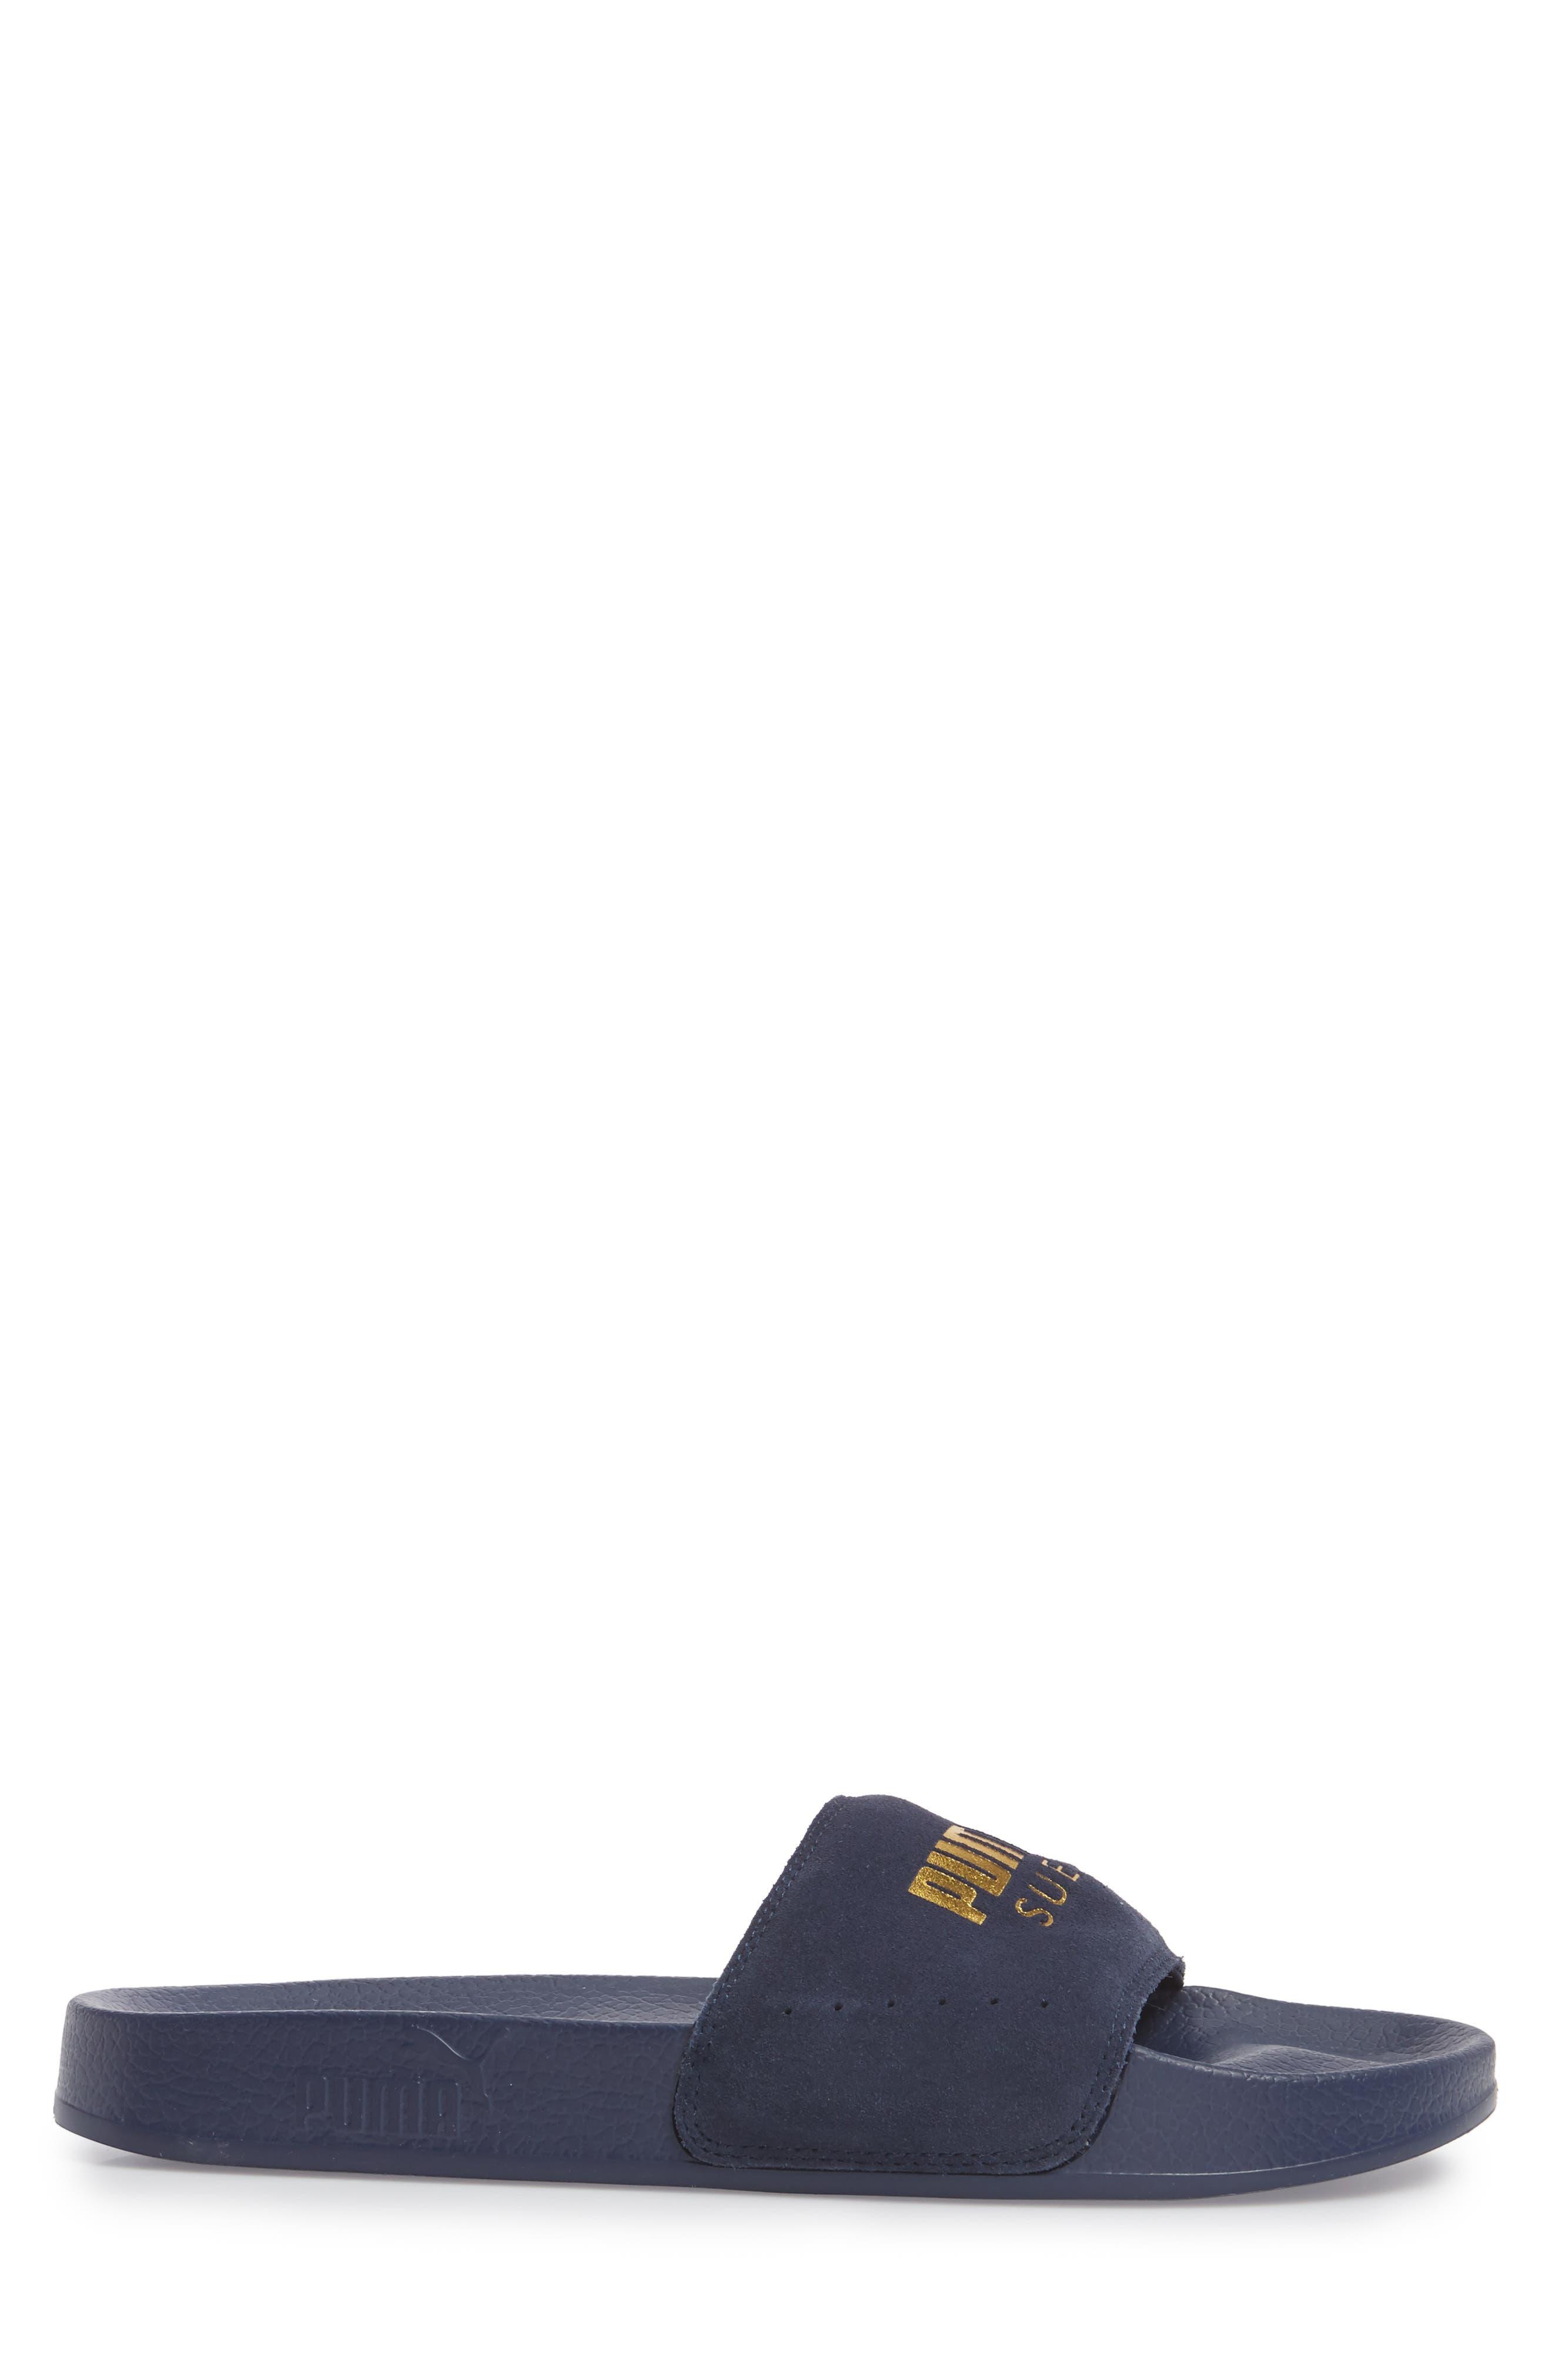 Leadcat Suede Slide Sandal,                             Alternate thumbnail 3, color,                             Peacoat/ Gold Leather/ Suede